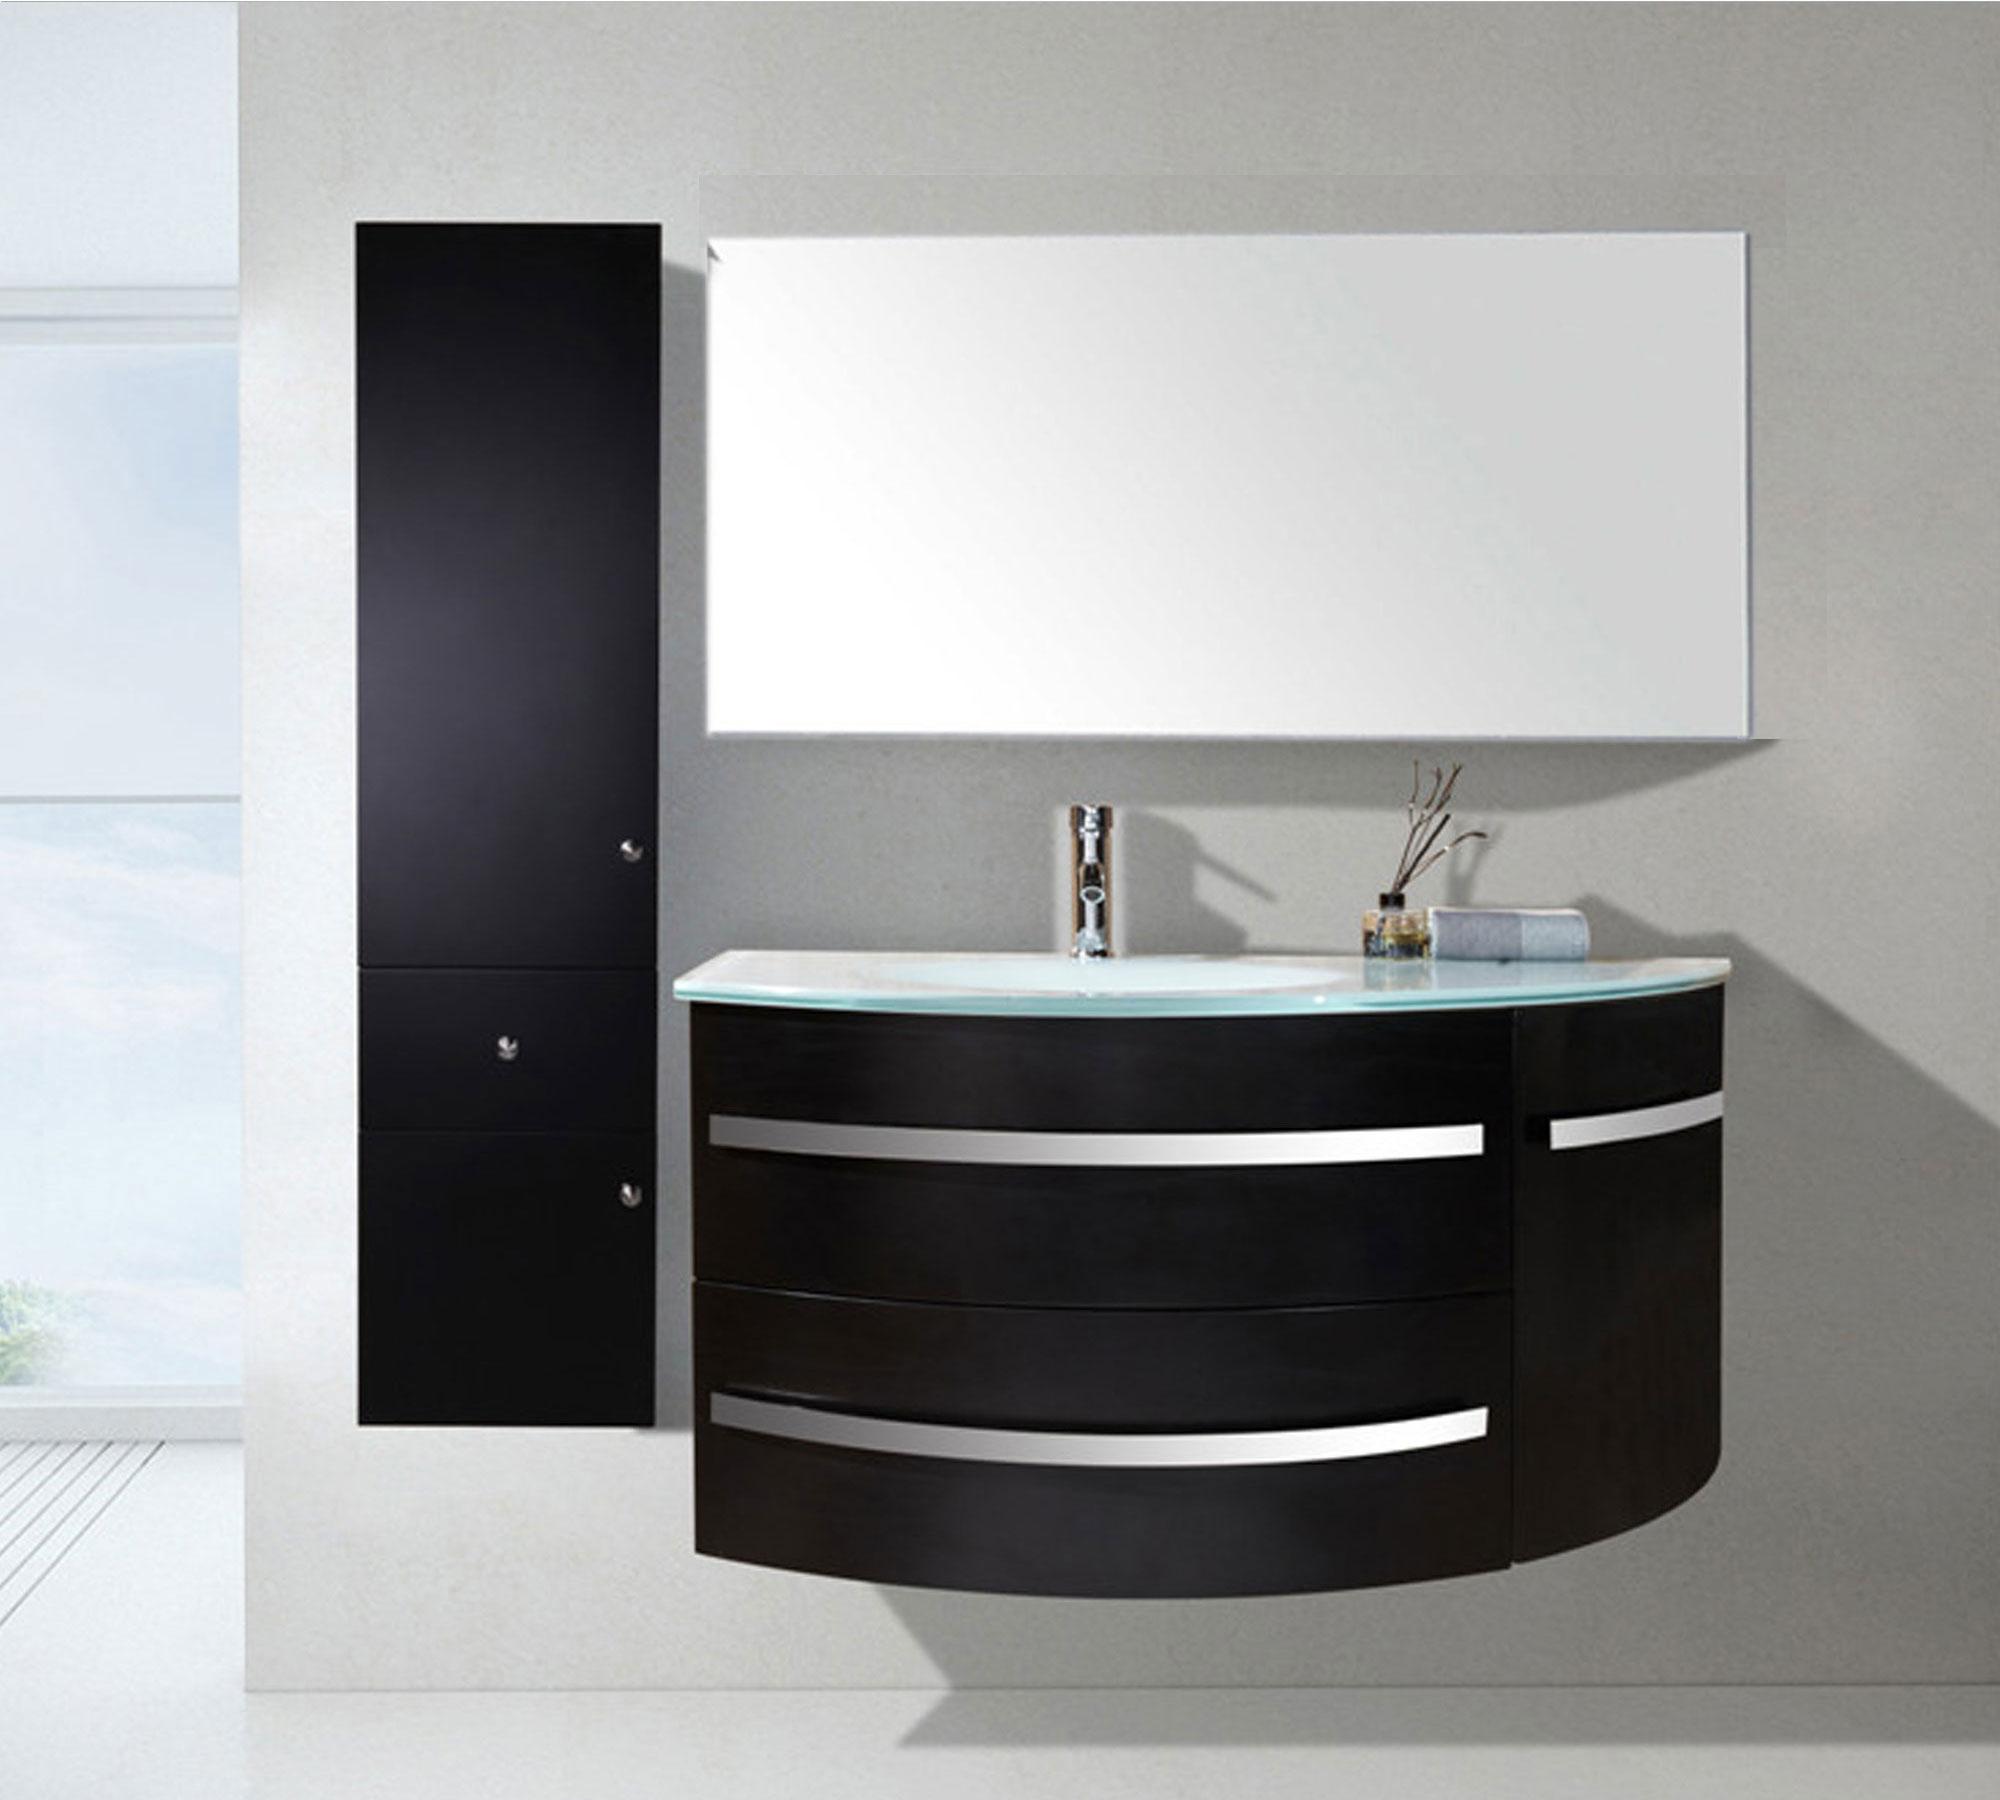 Black ambassador mobile bagno arredo bagno 120 cm - Colonna arredo bagno ...